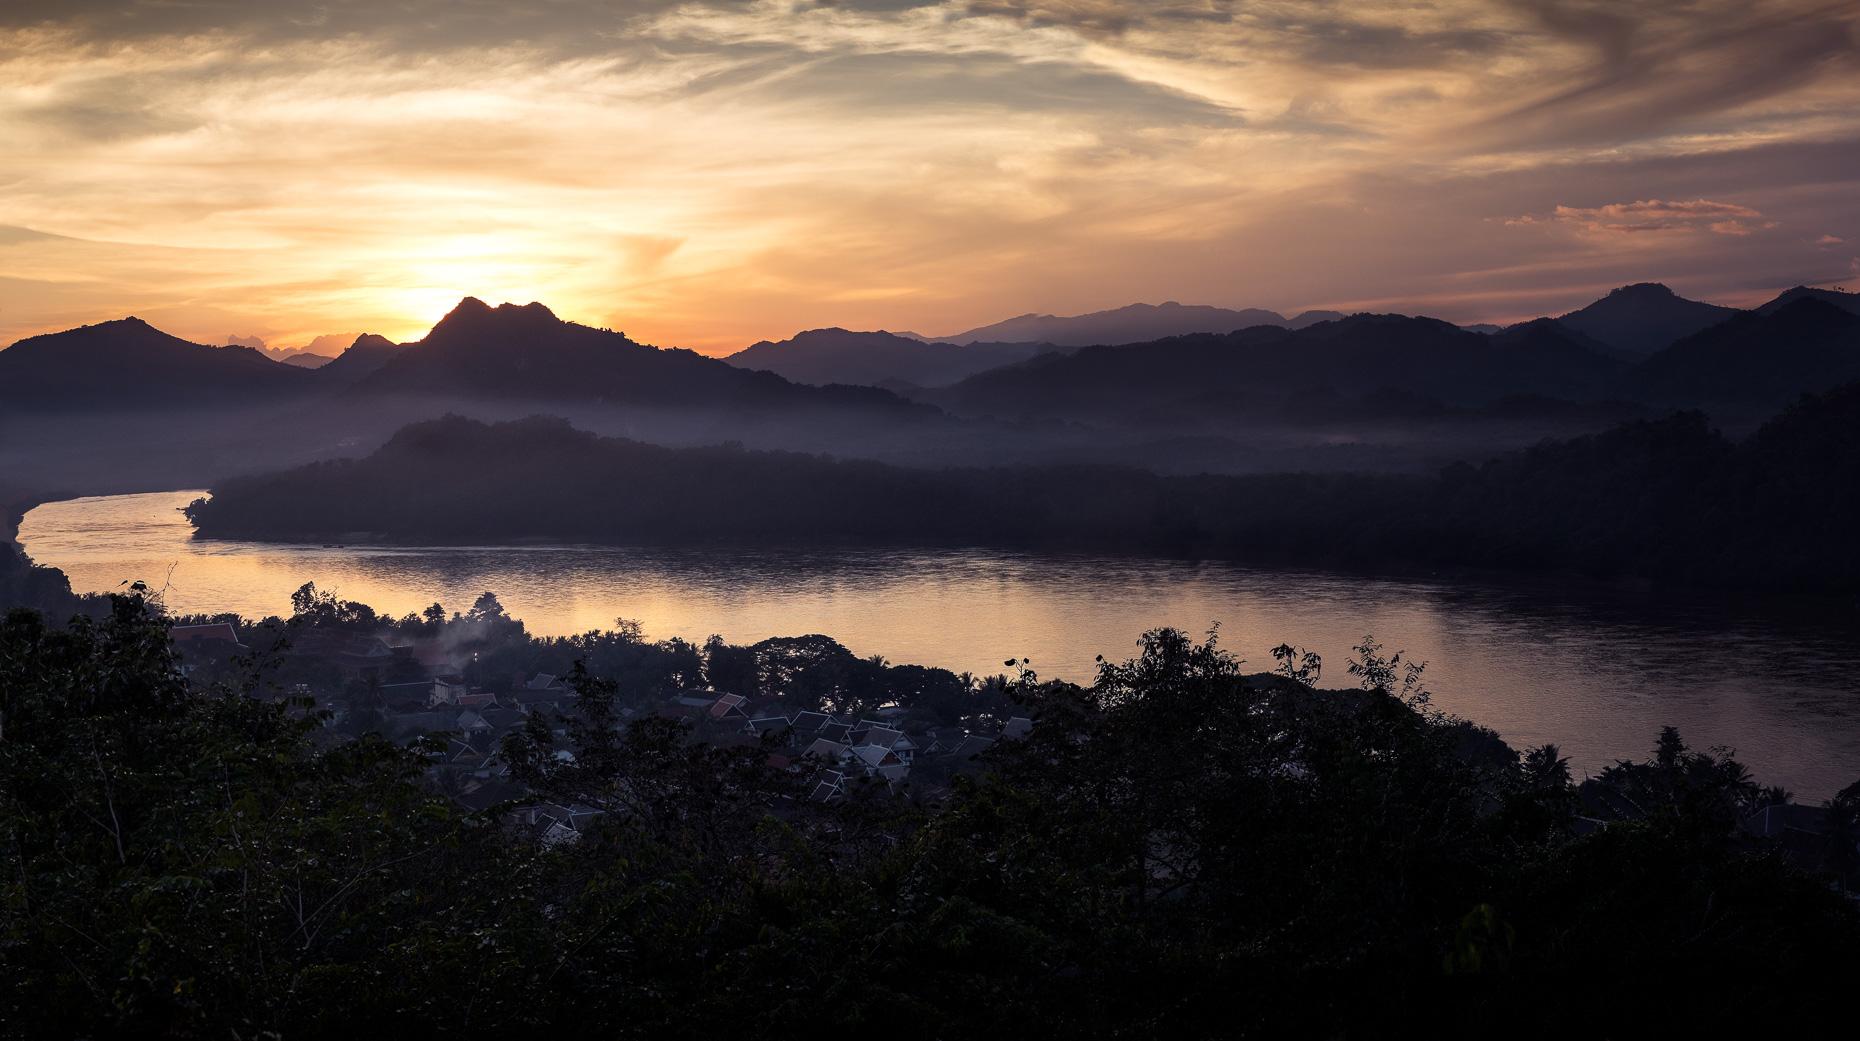 Luang_Prabang_Sunset_Composite.jpg